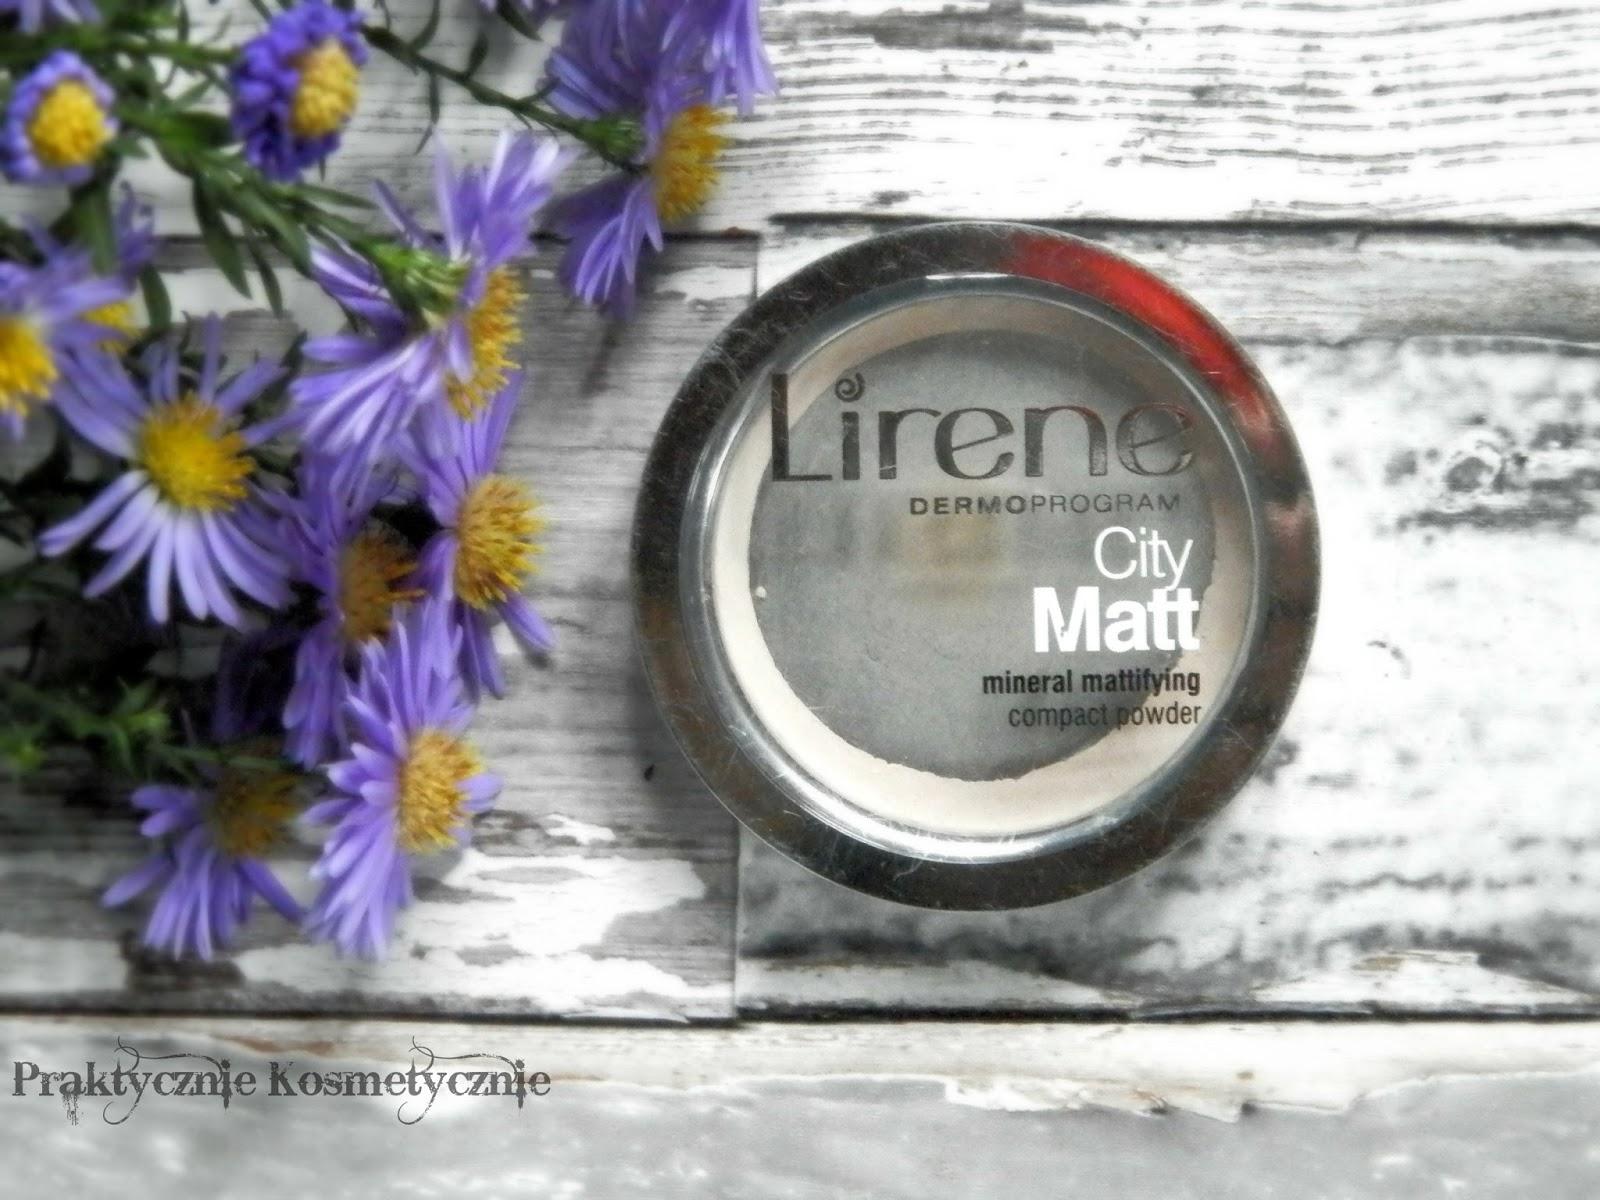 Lirene City Matt - mineralny puder matujący.